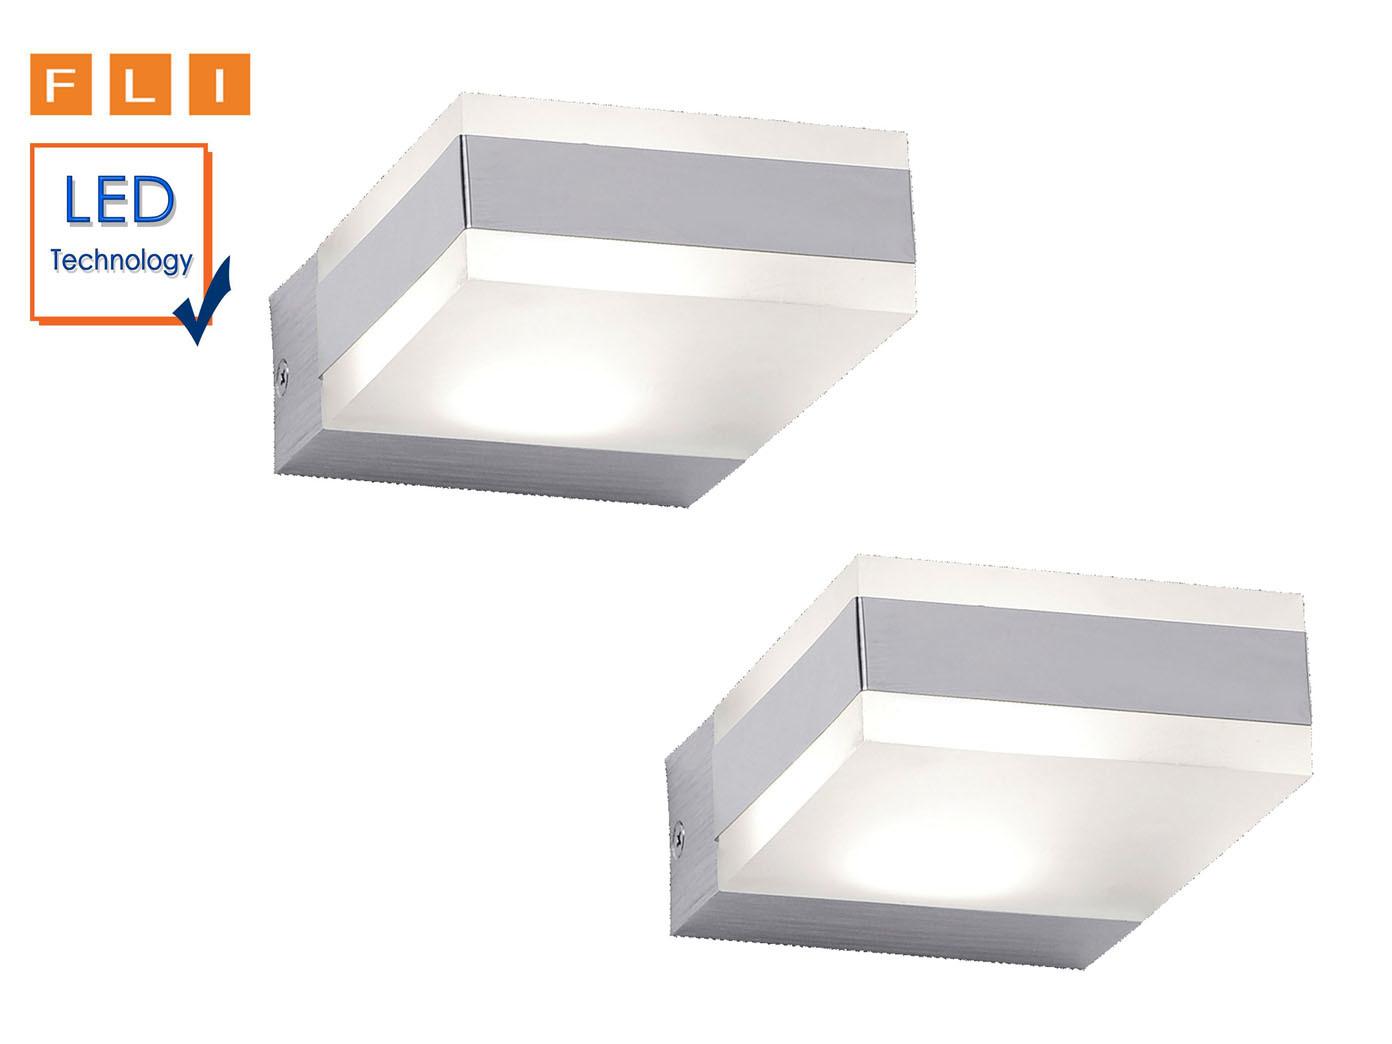 Flurlampen led finest k led kristall leuchte moderne - Flurlampen modern ...